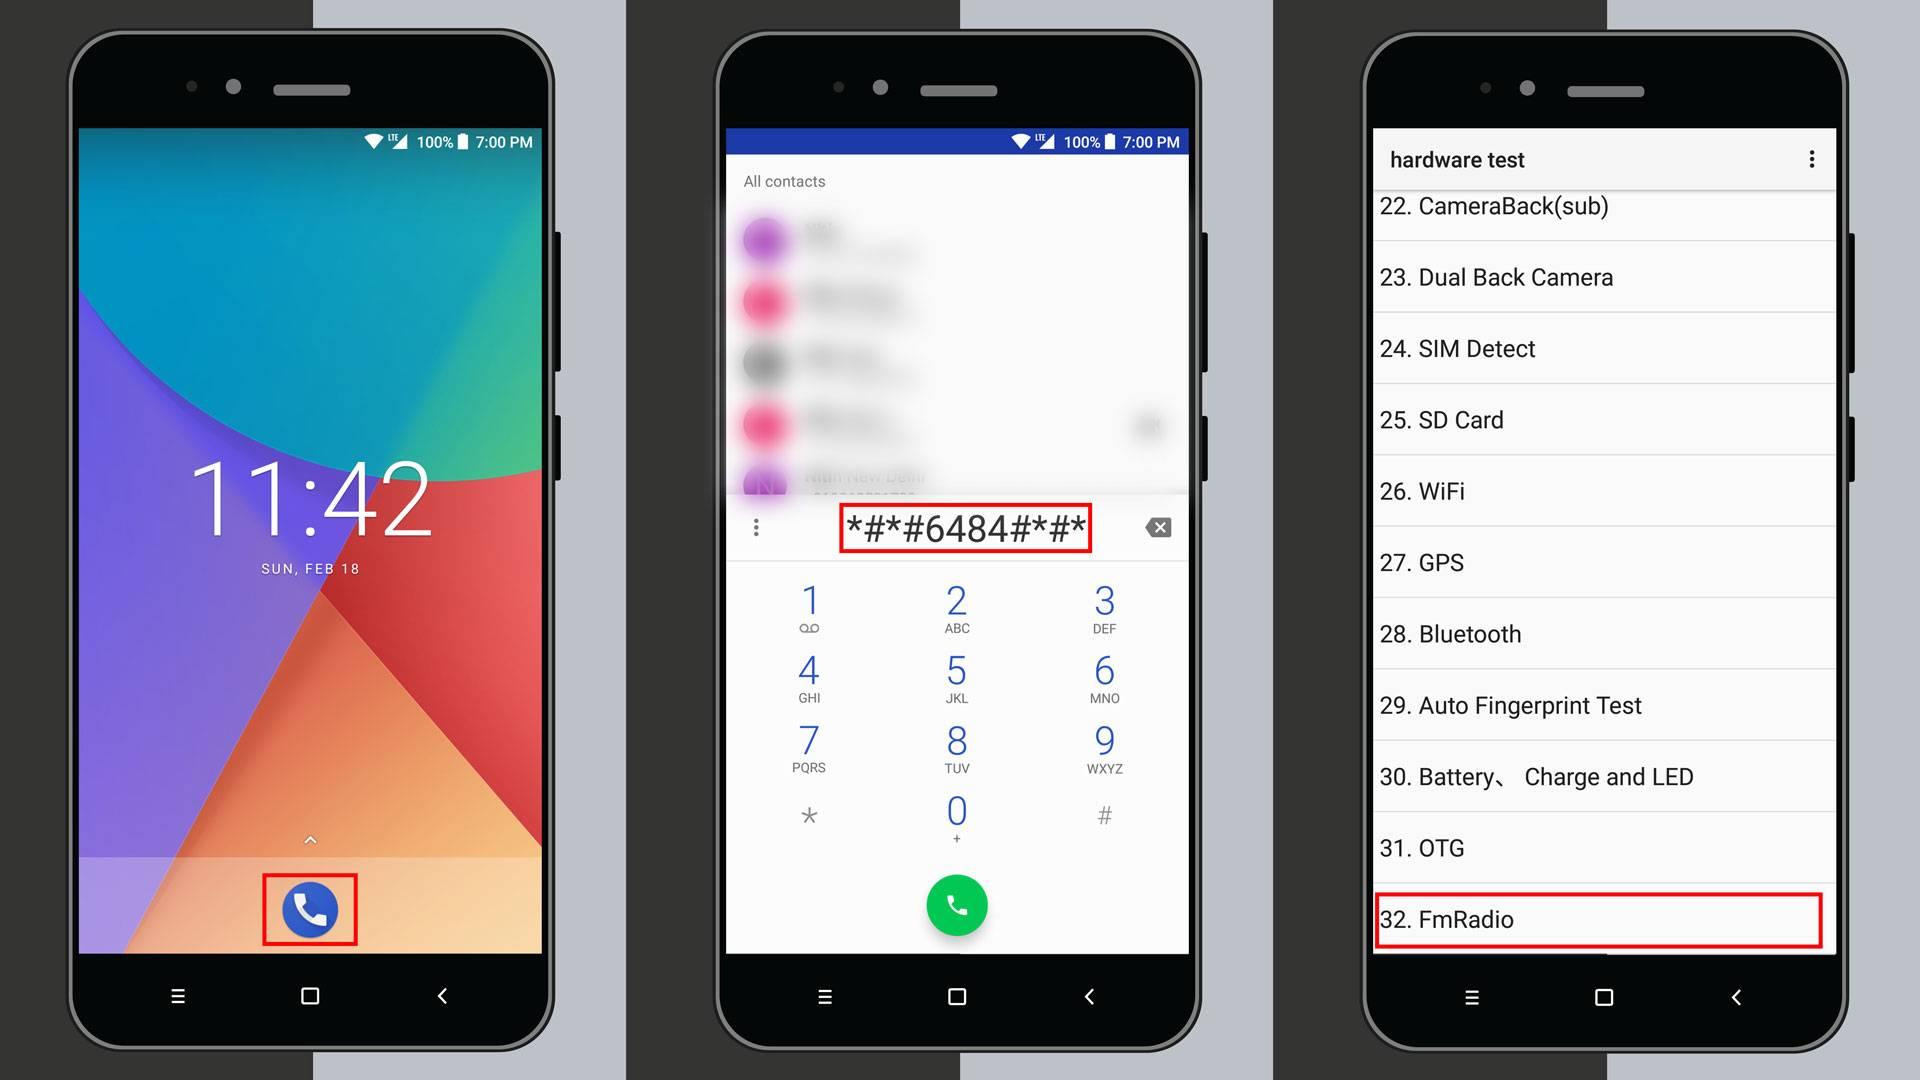 fm radio mi a1 1 - How to enable FM Radio on Xiaomi Mi A1?